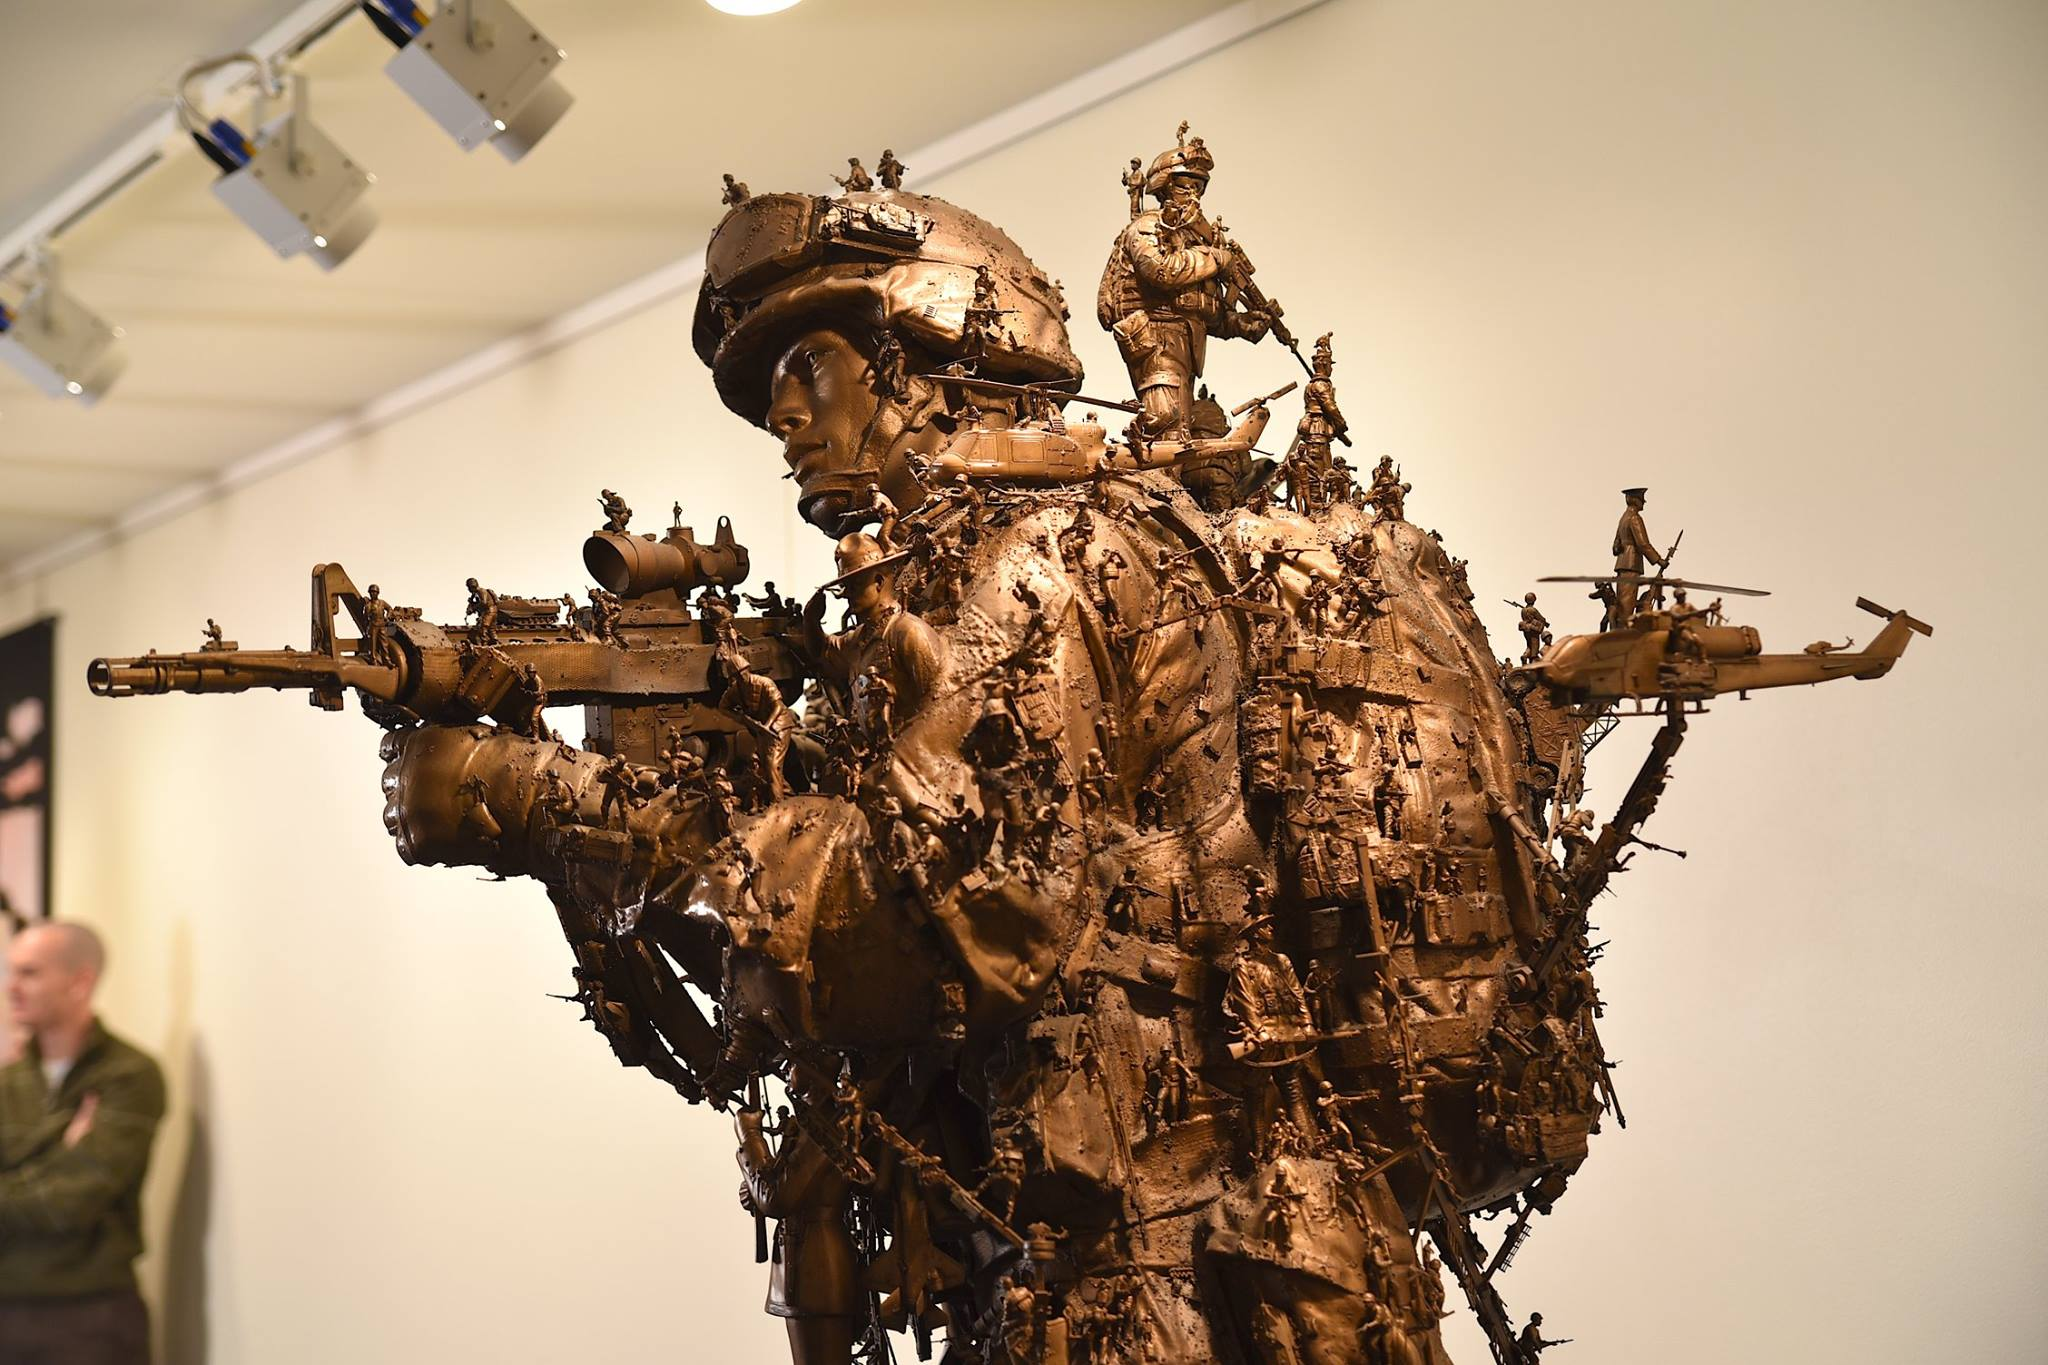 Marine Corps Museum puts intricate 'Battles Won' sculptures on display (PHOTOS) 2